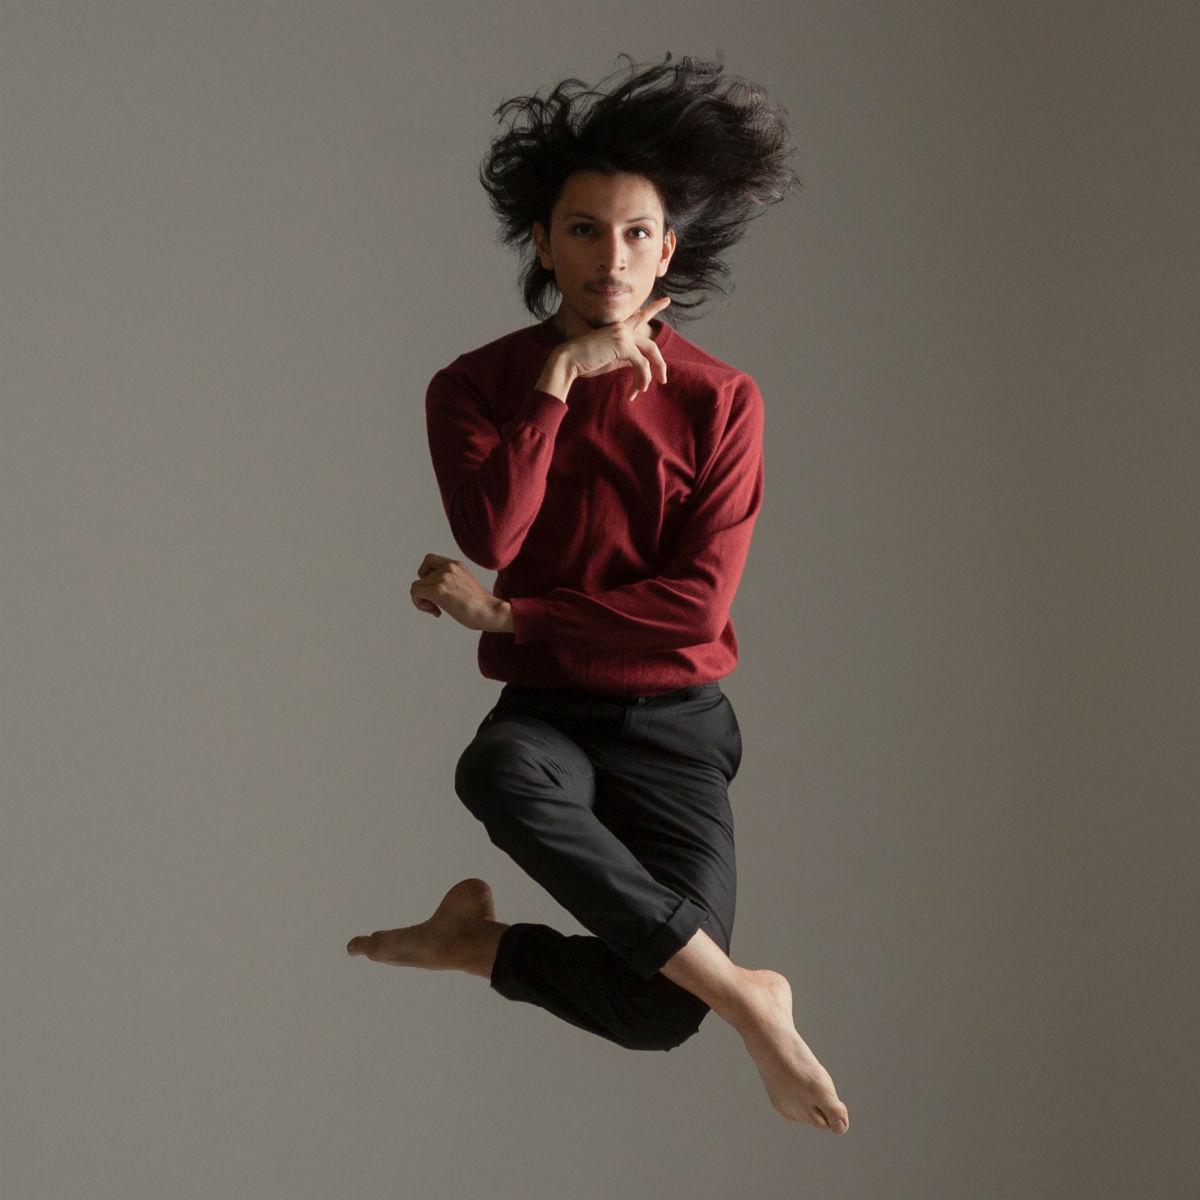 Chrystal Dance Prize